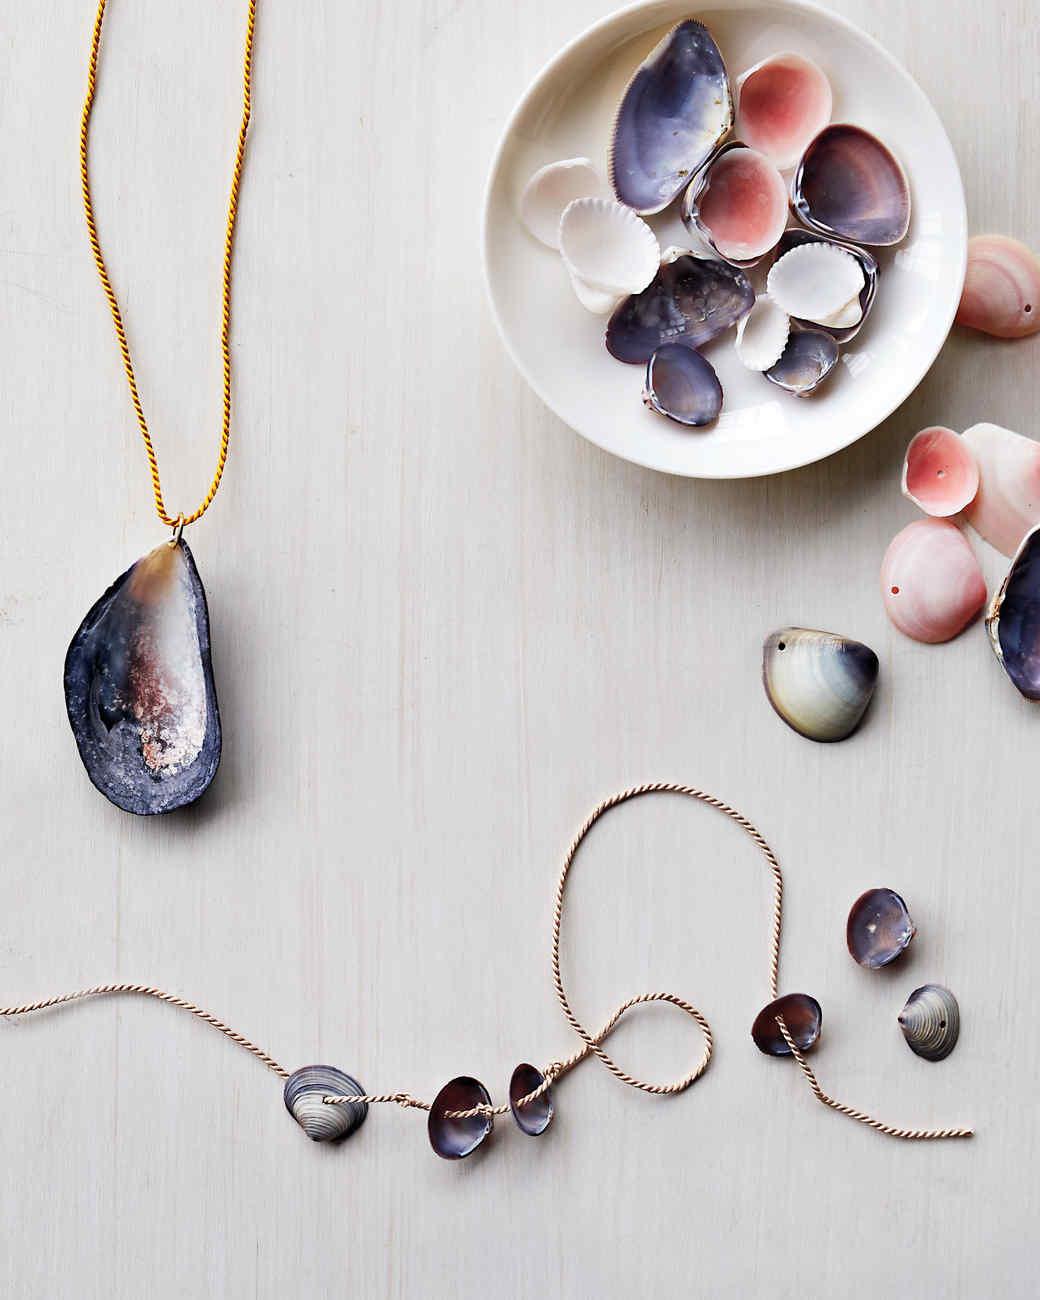 shell-jewelry-142-d111999.jpg